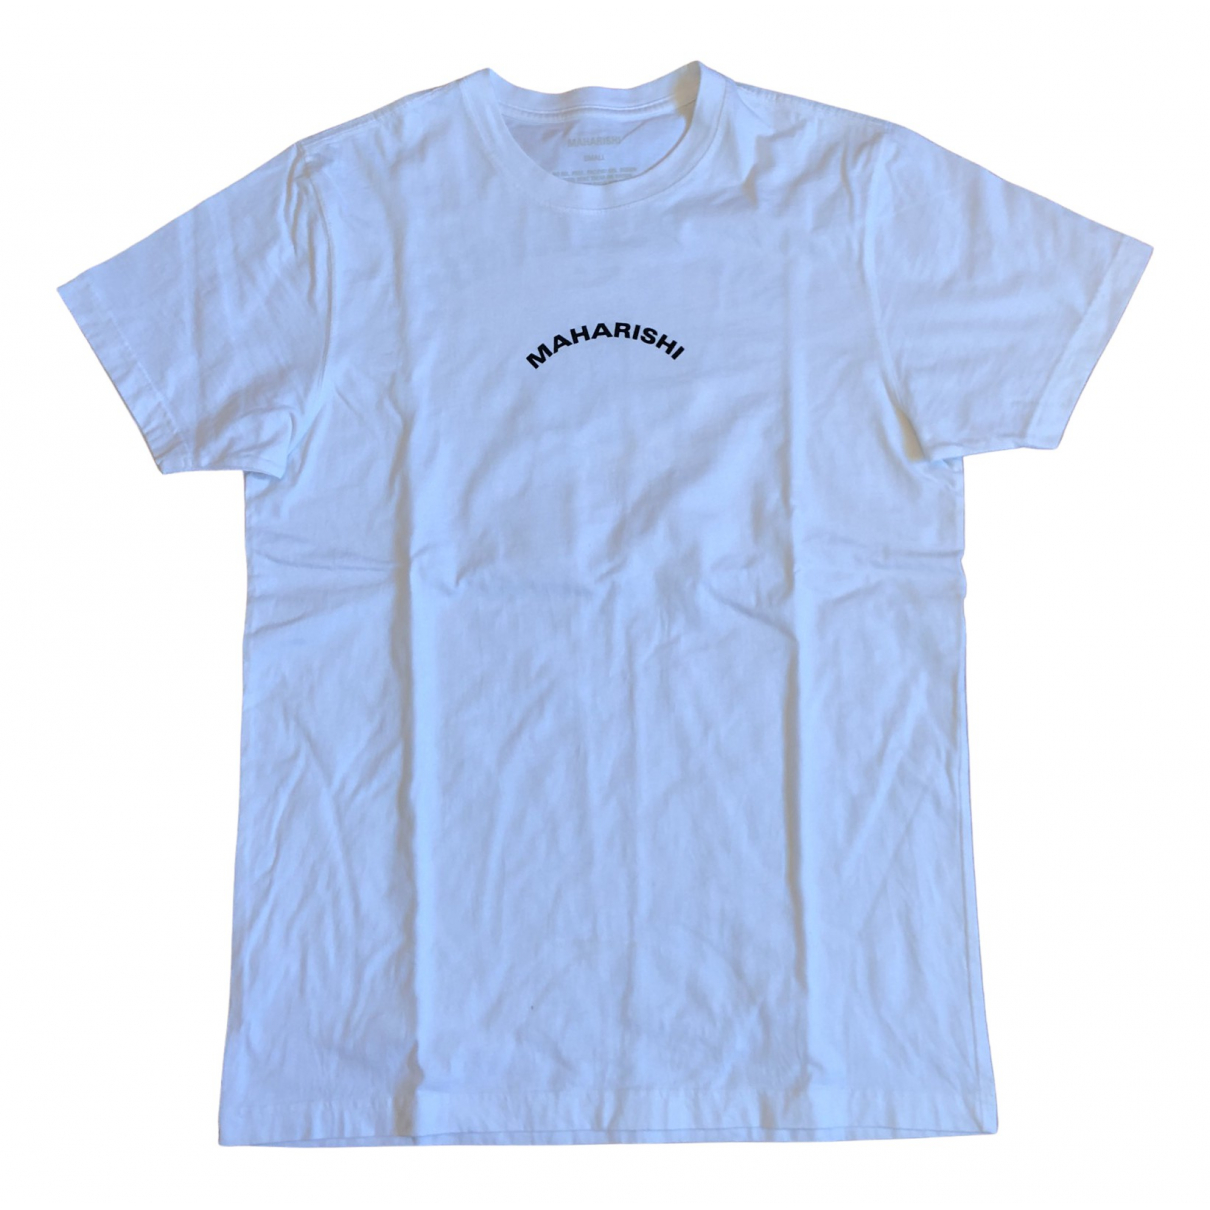 Maharishi - Tee shirts   pour homme en coton - blanc